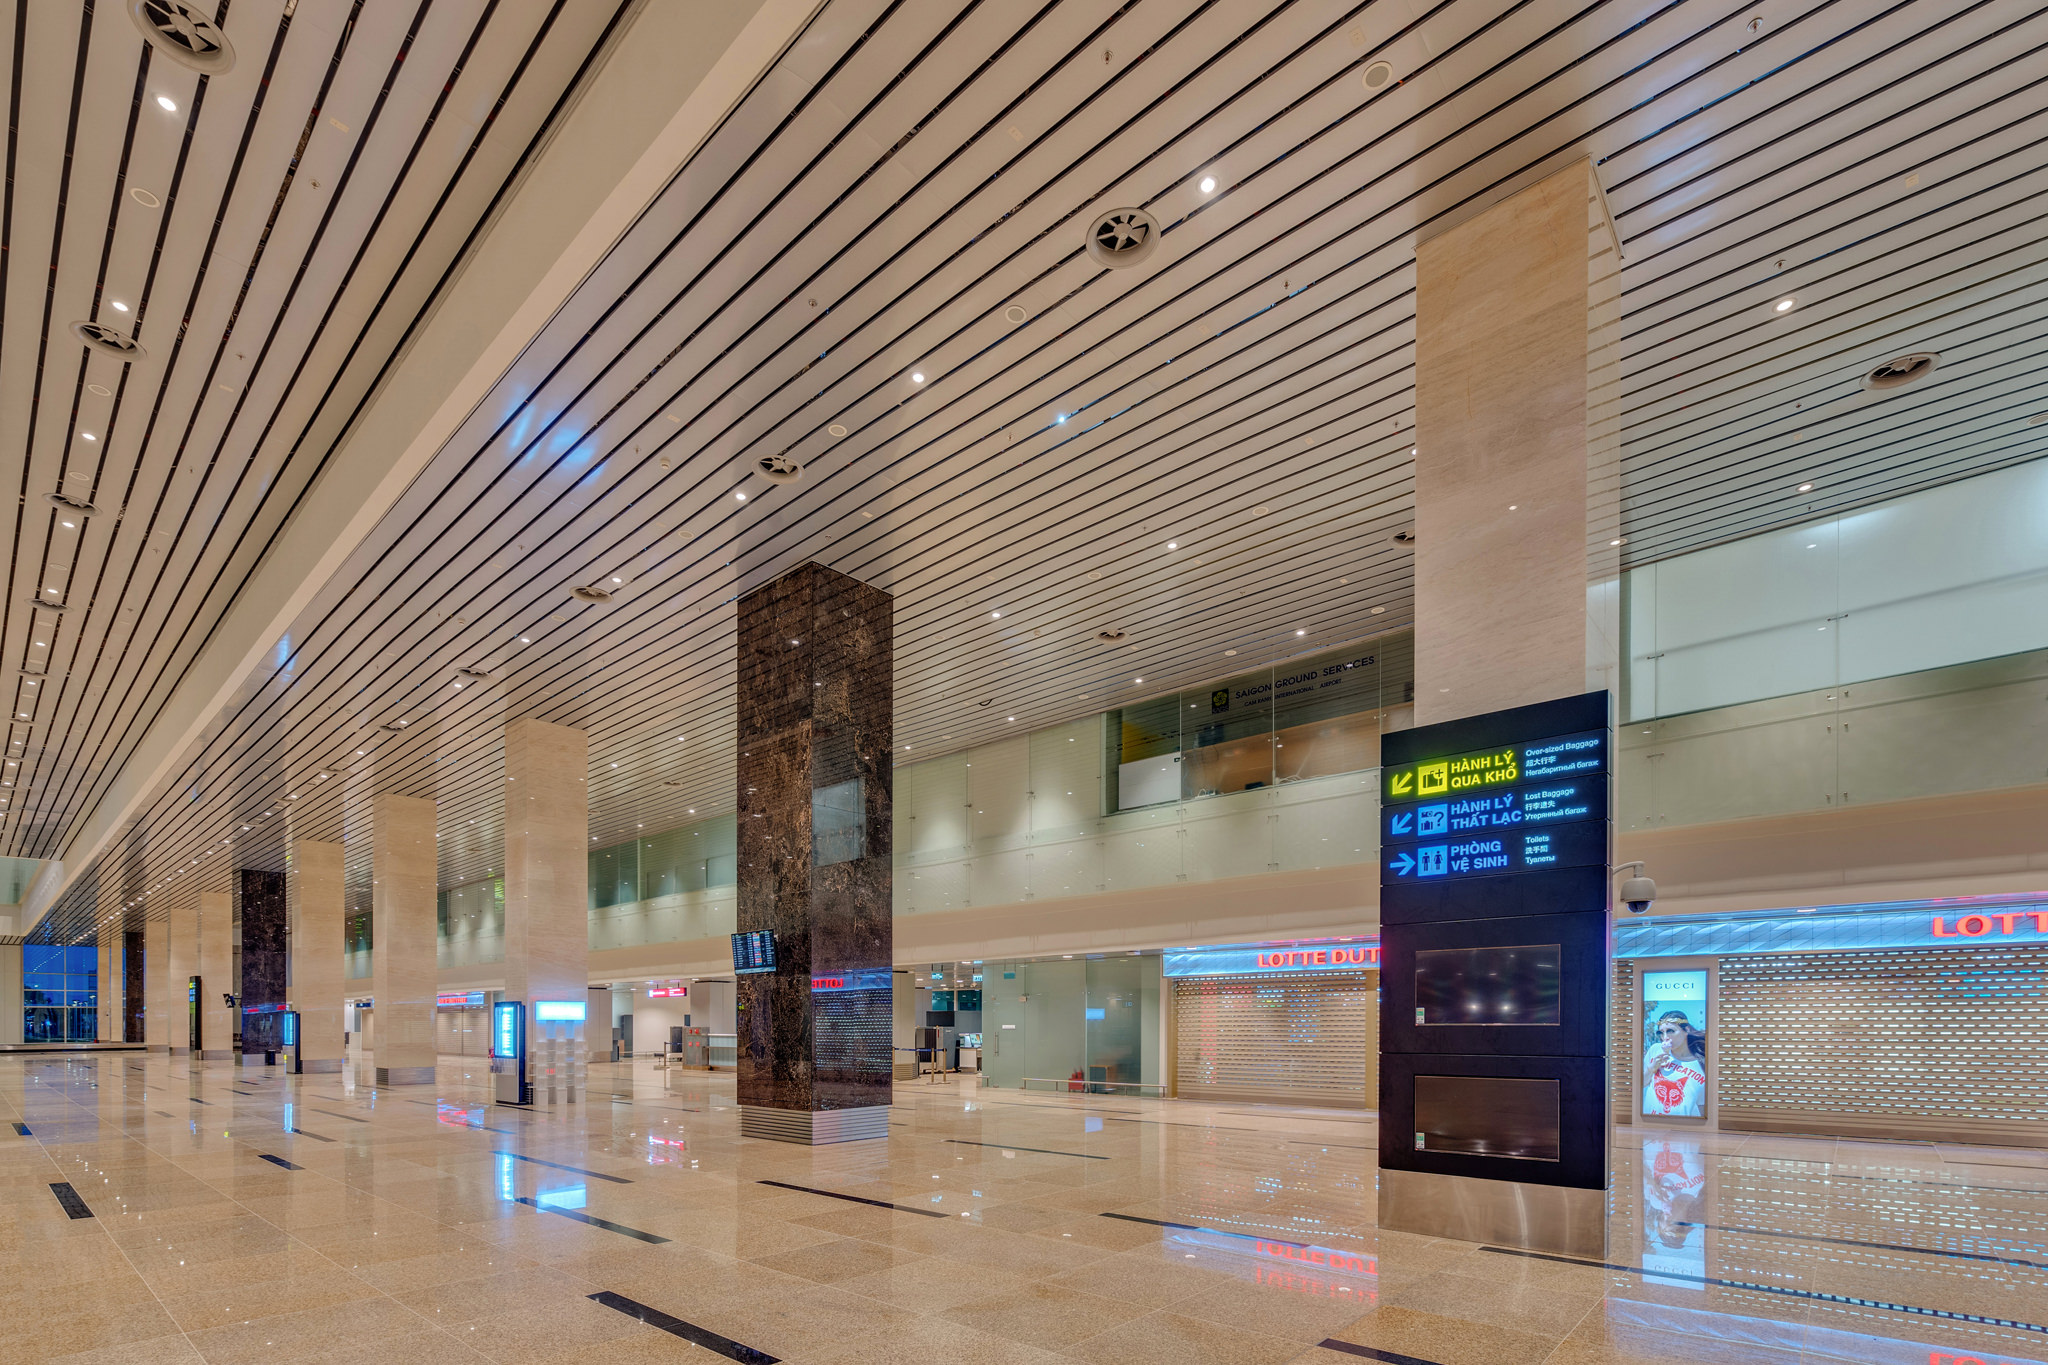 20180626 - Cam Ranh Airport - Architecture - 0409.jpg